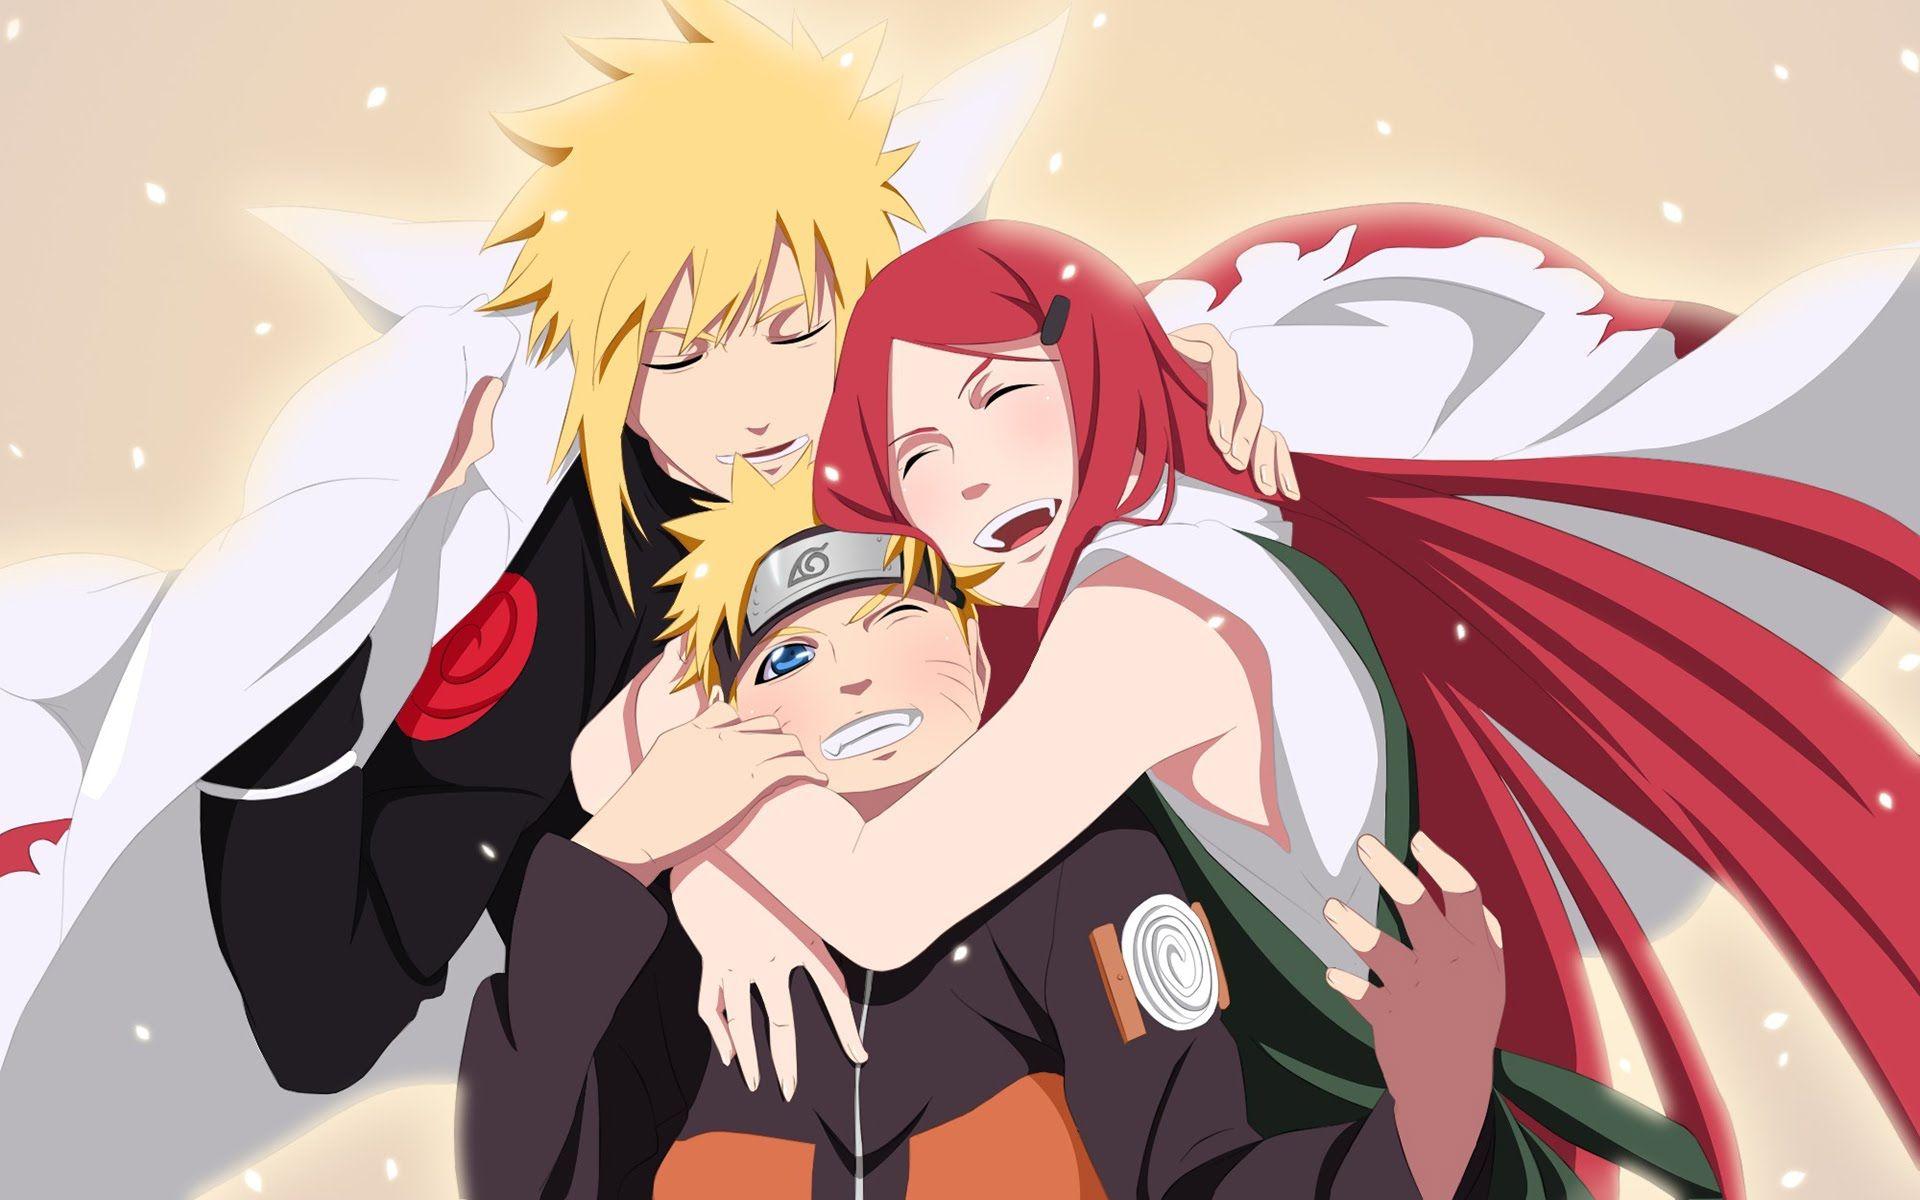 Most Inspiring Wallpaper Naruto Emotional - 175a79883fc50a3e7f3aca4a61c15ecb  Pictures_801392.jpg